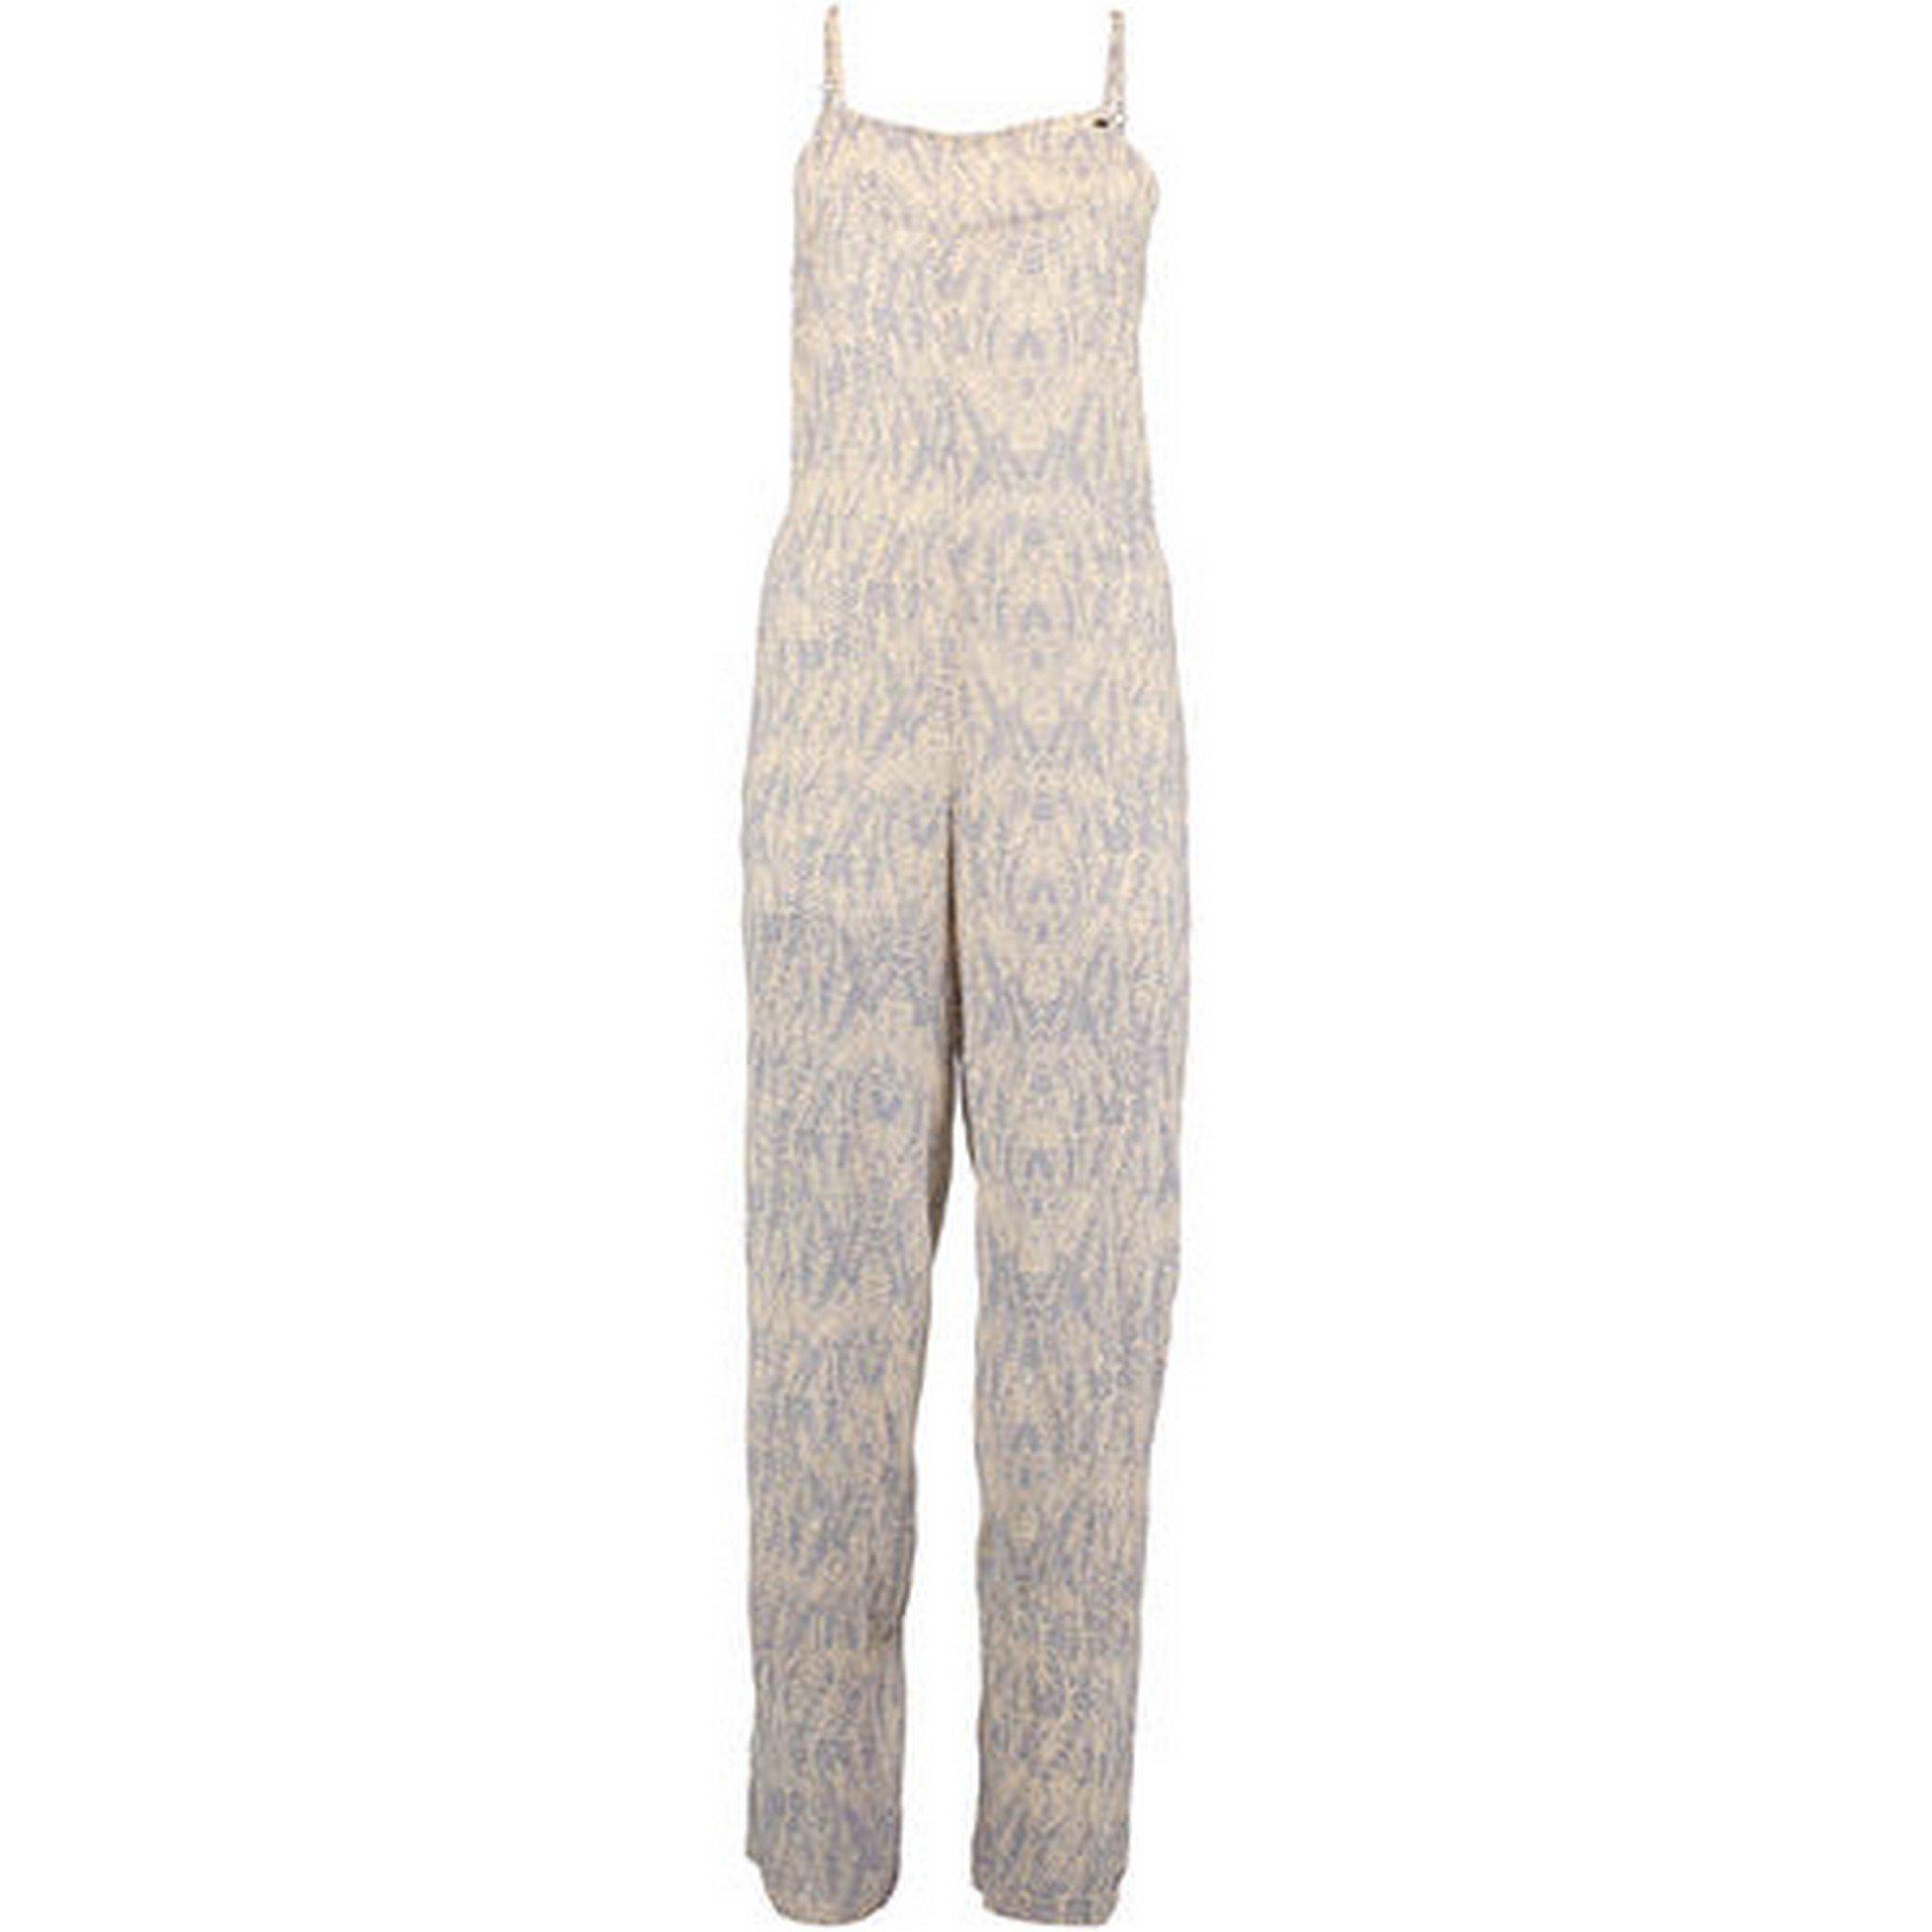 O'Neill Womens/Ladies Print Palazzo Jumpsuit (XL) (Blue/White)